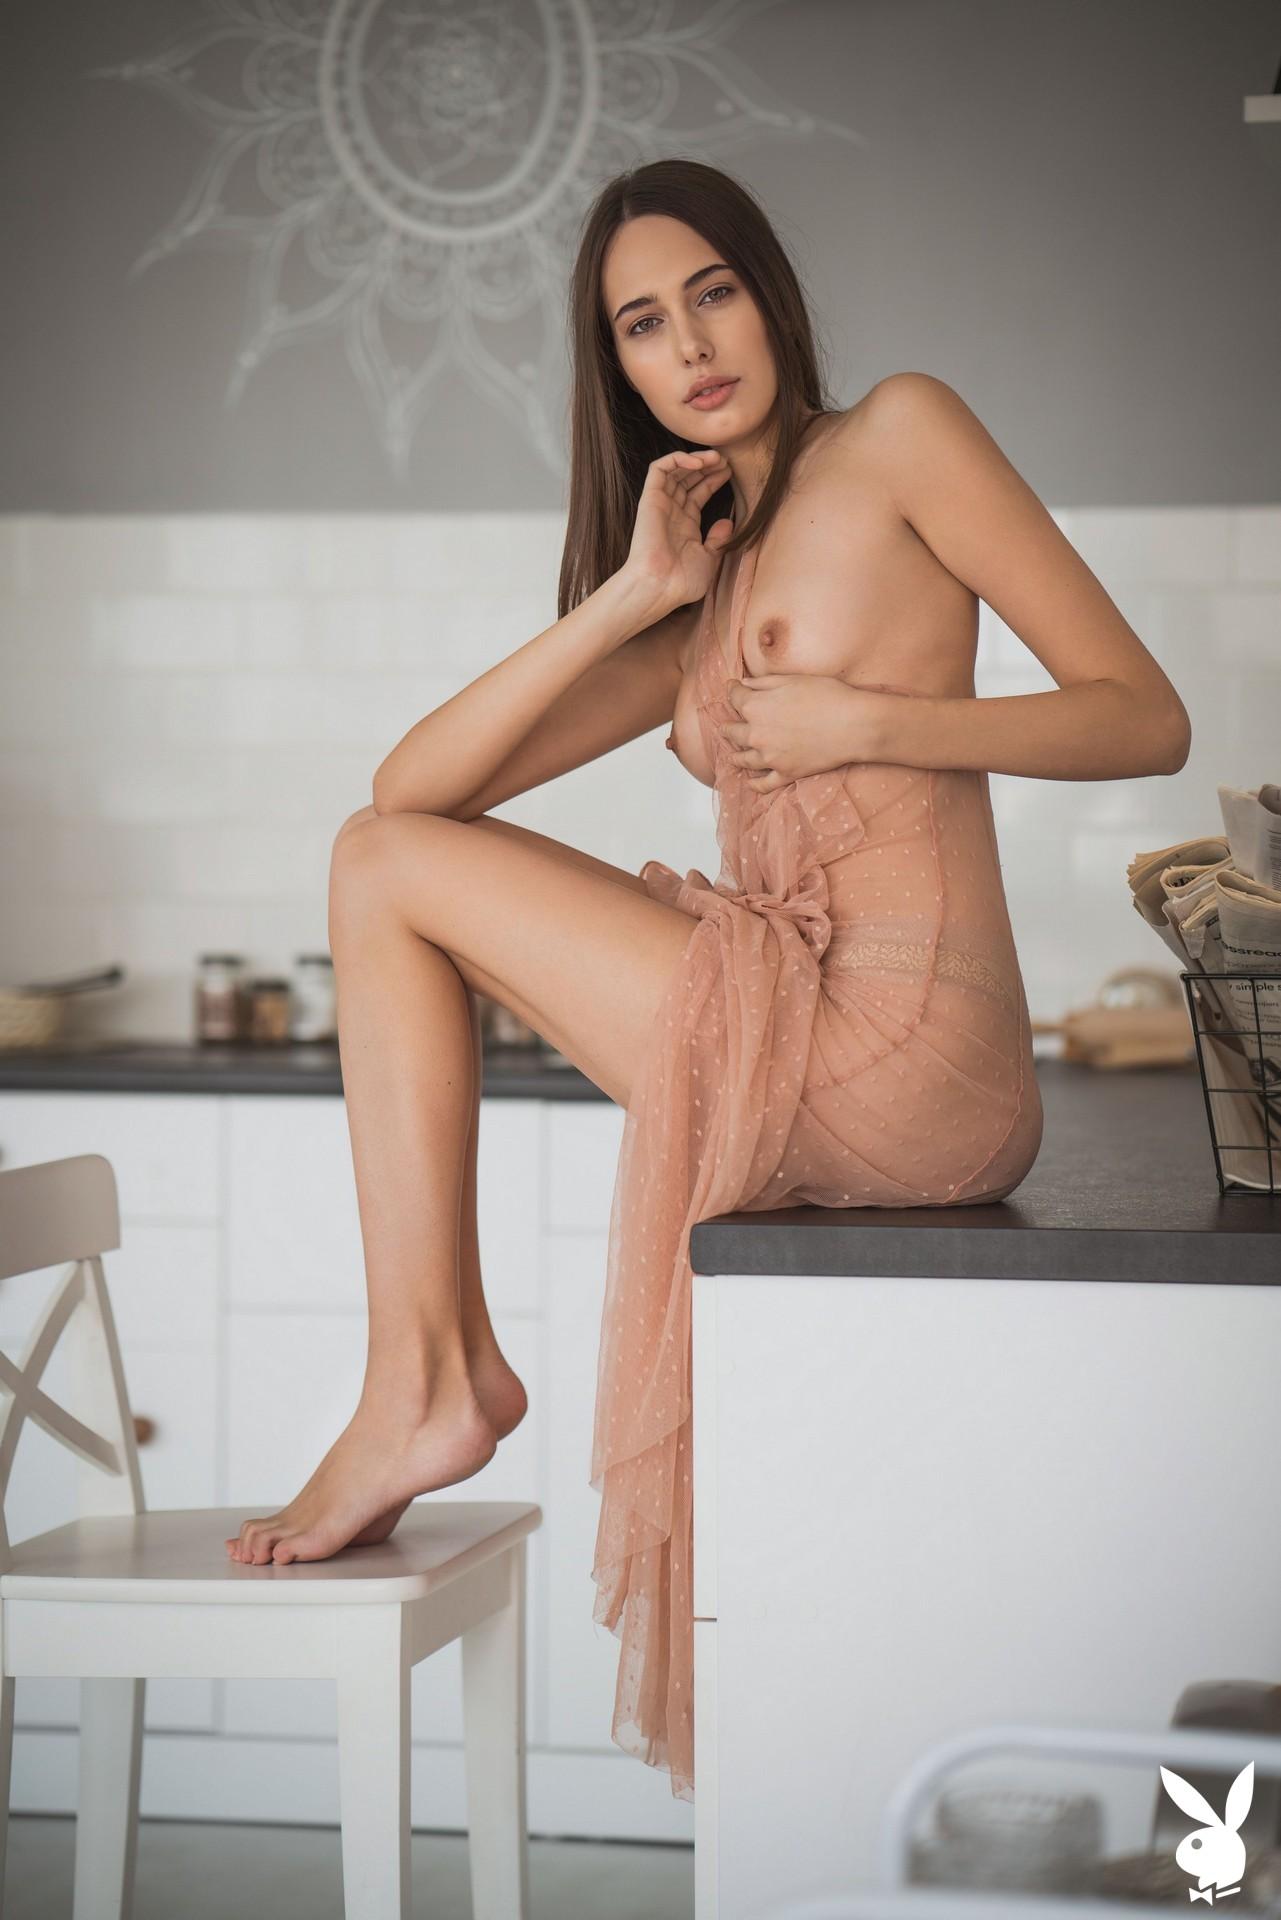 Katrine Pirs In Essence Of Life Playboy Plus (5)